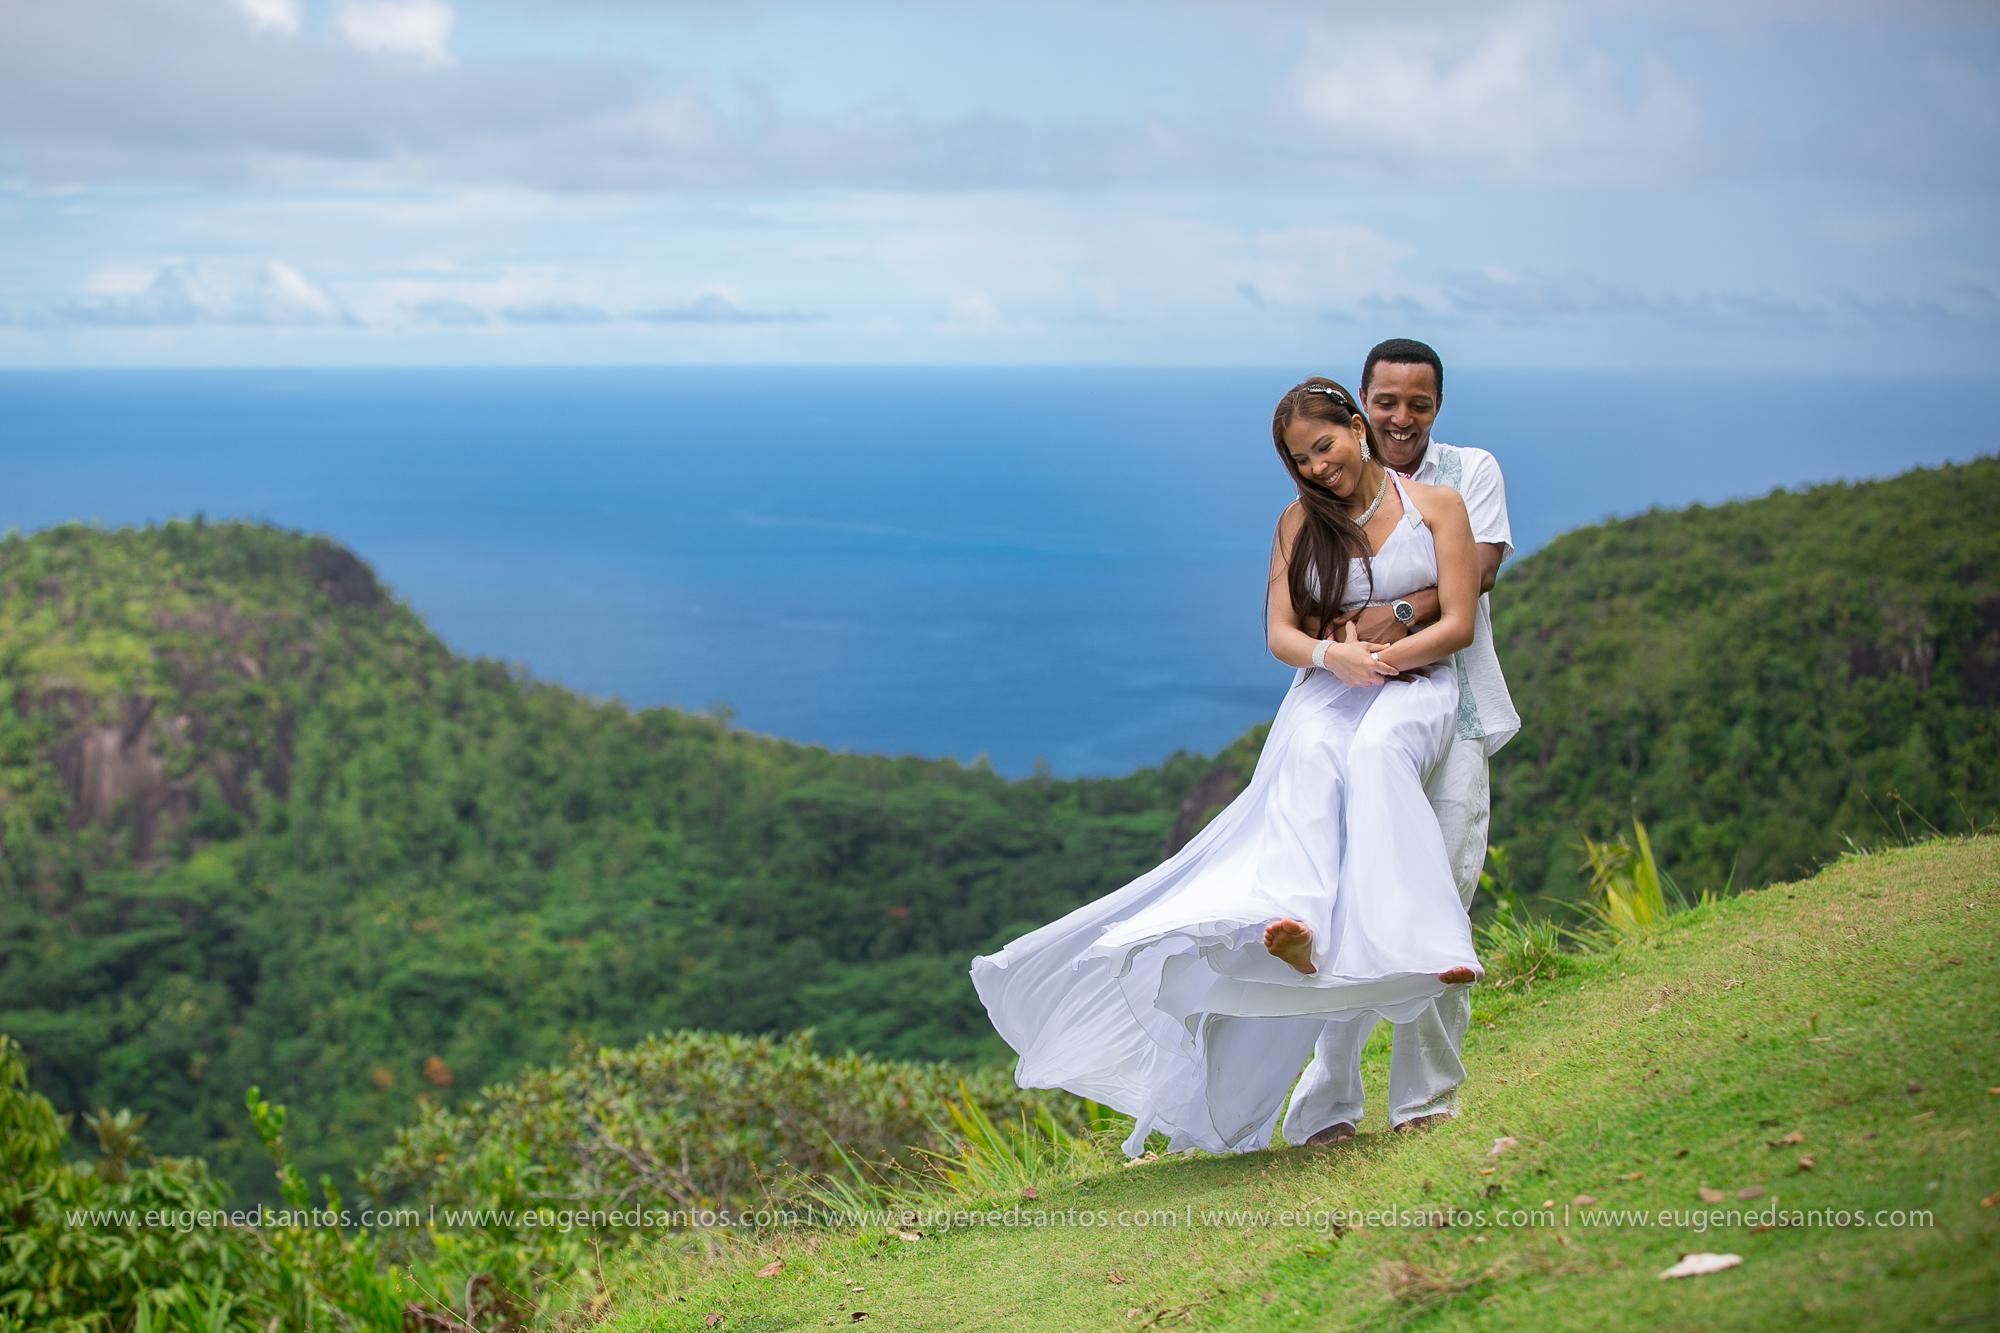 Seychelles Prenup